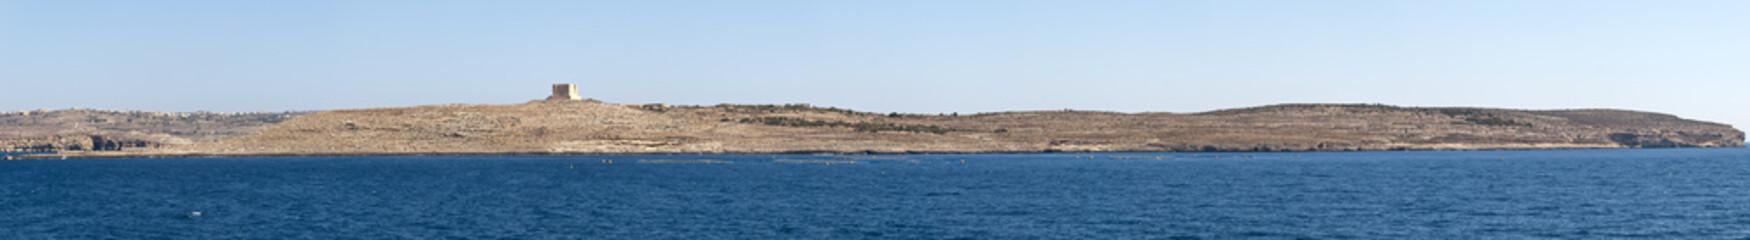 Island of Comino